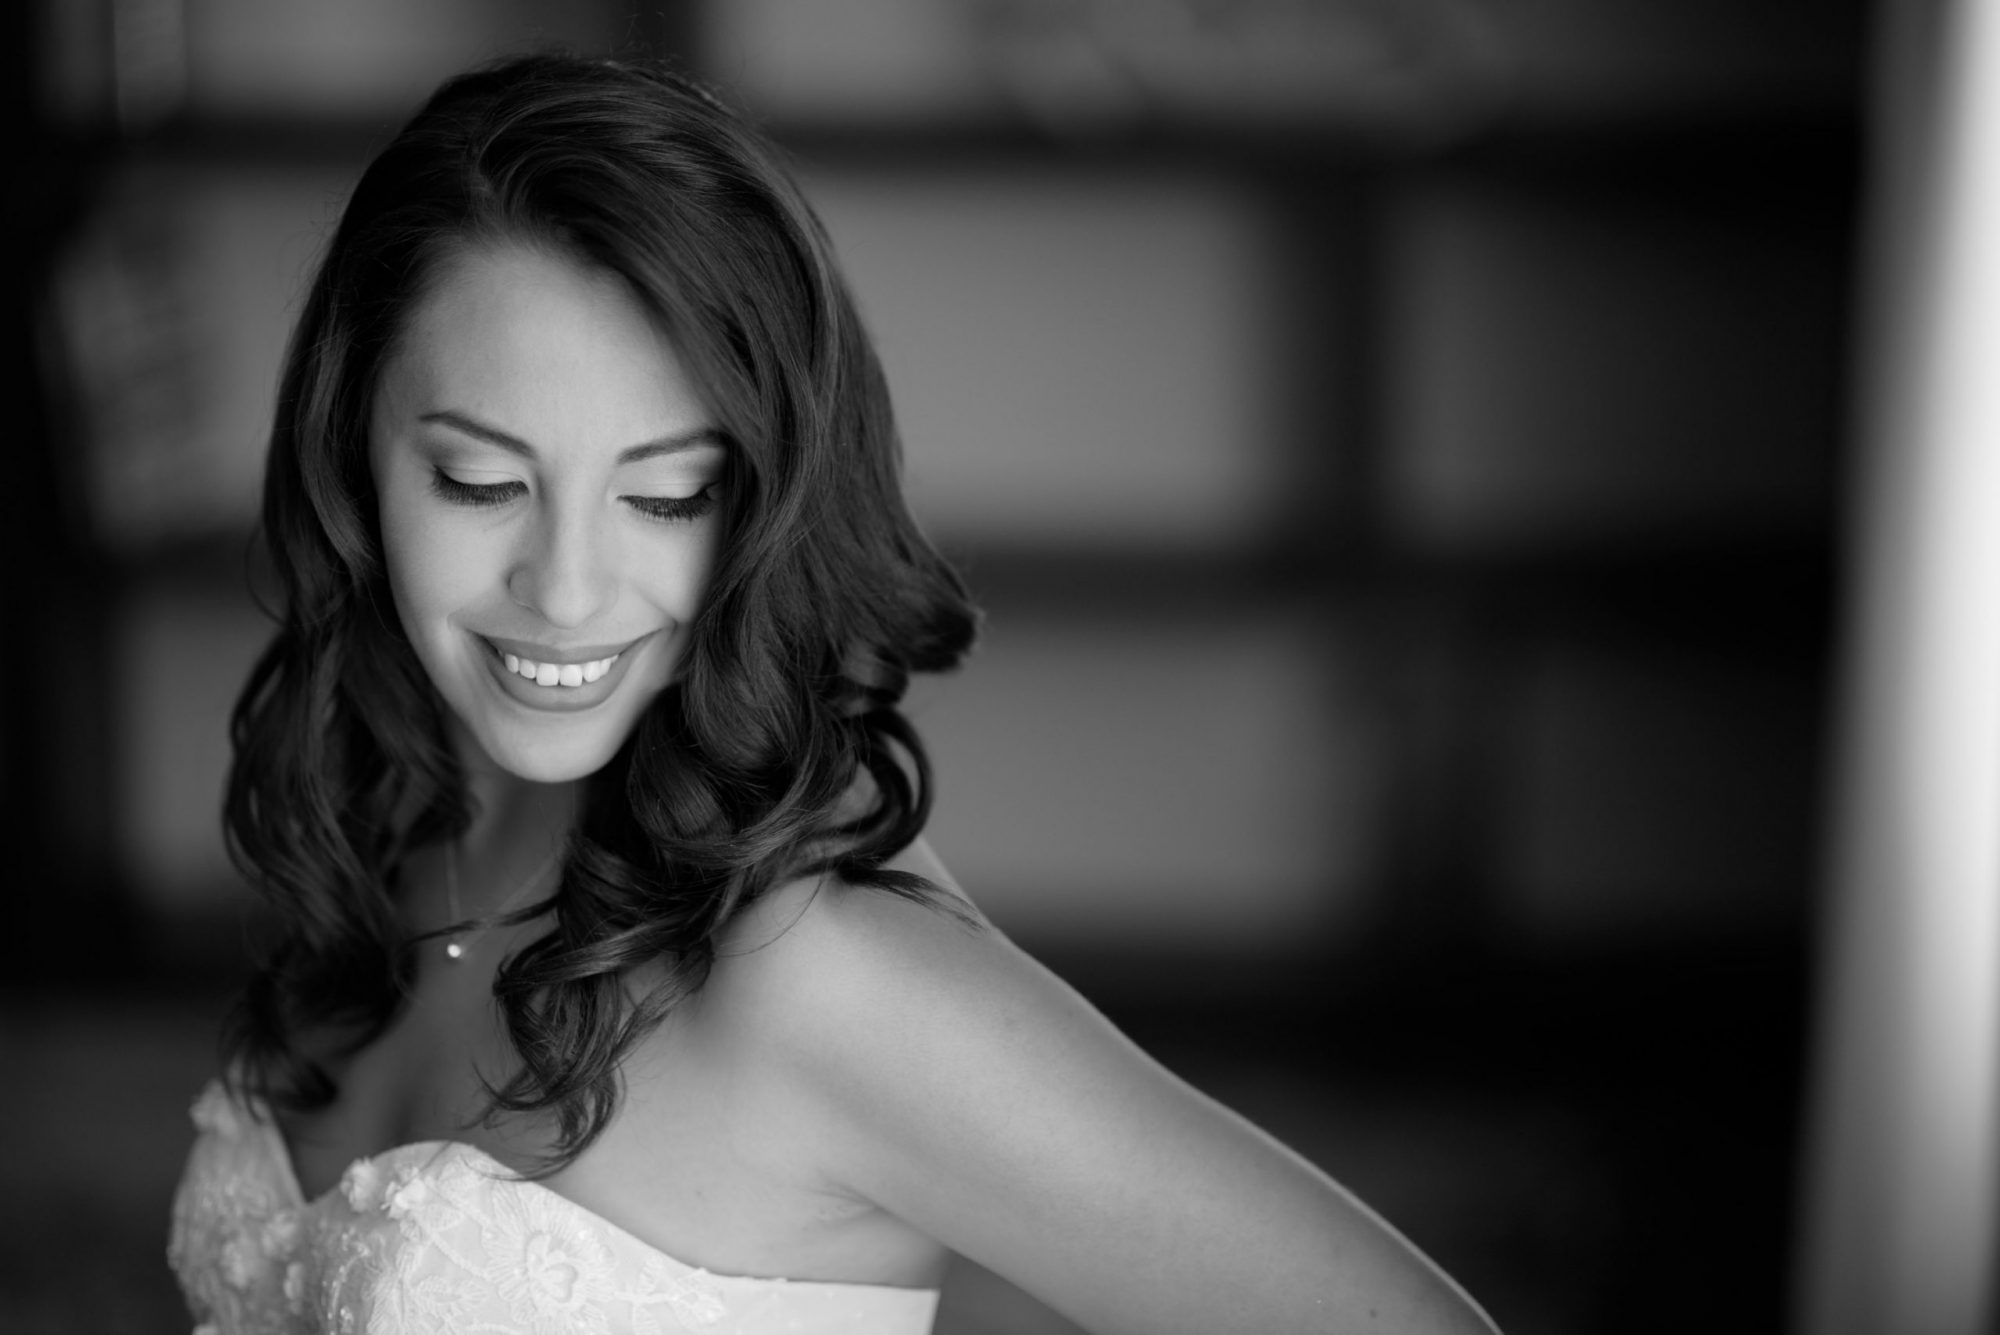 Bride Close Up Shjeraton Lisle Naperville